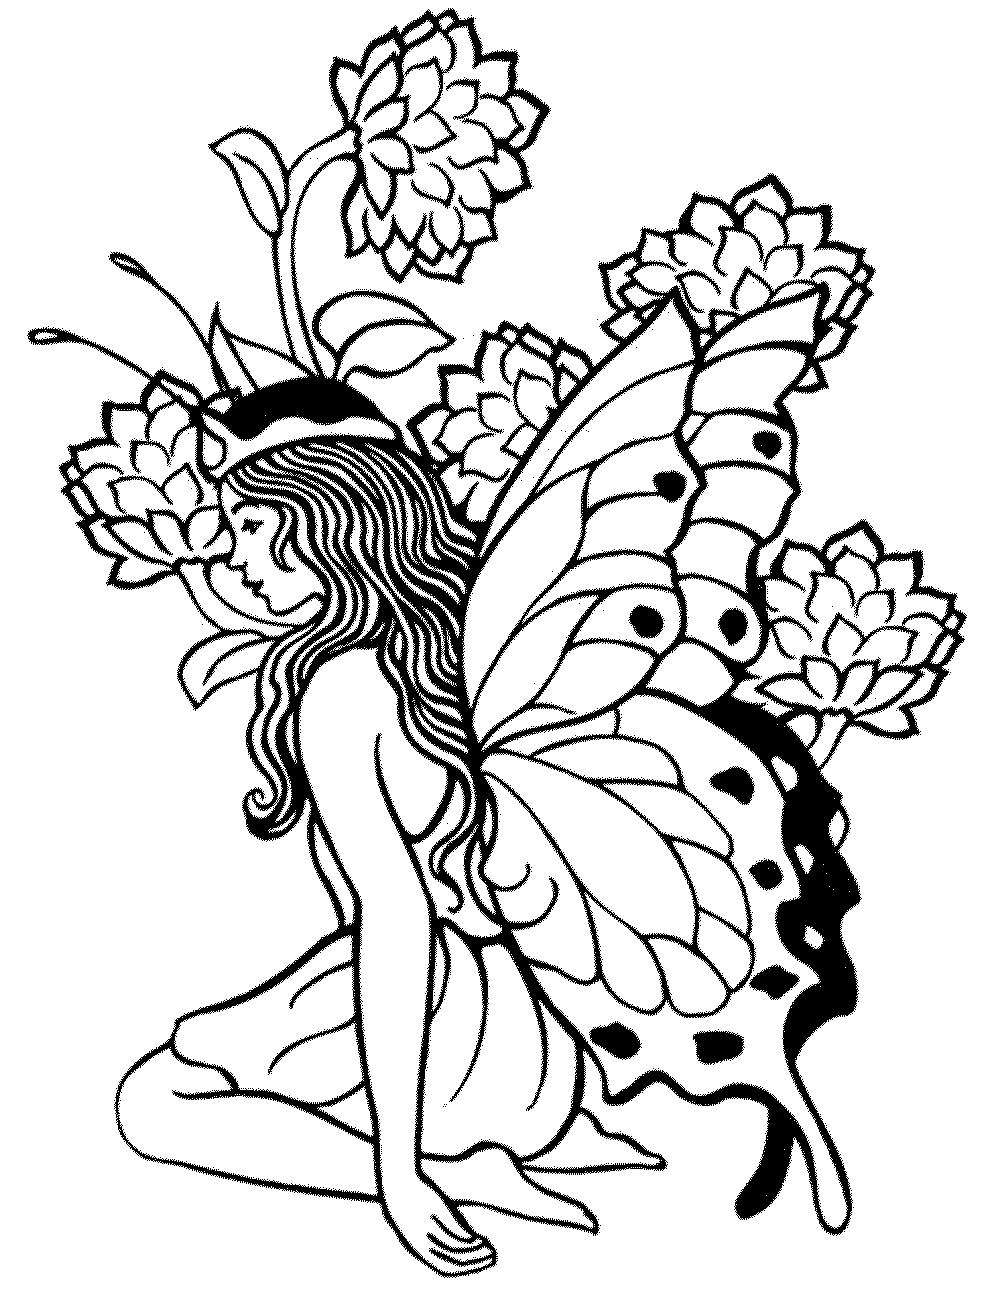 fairies and unicorn colouring - Clip Art Library